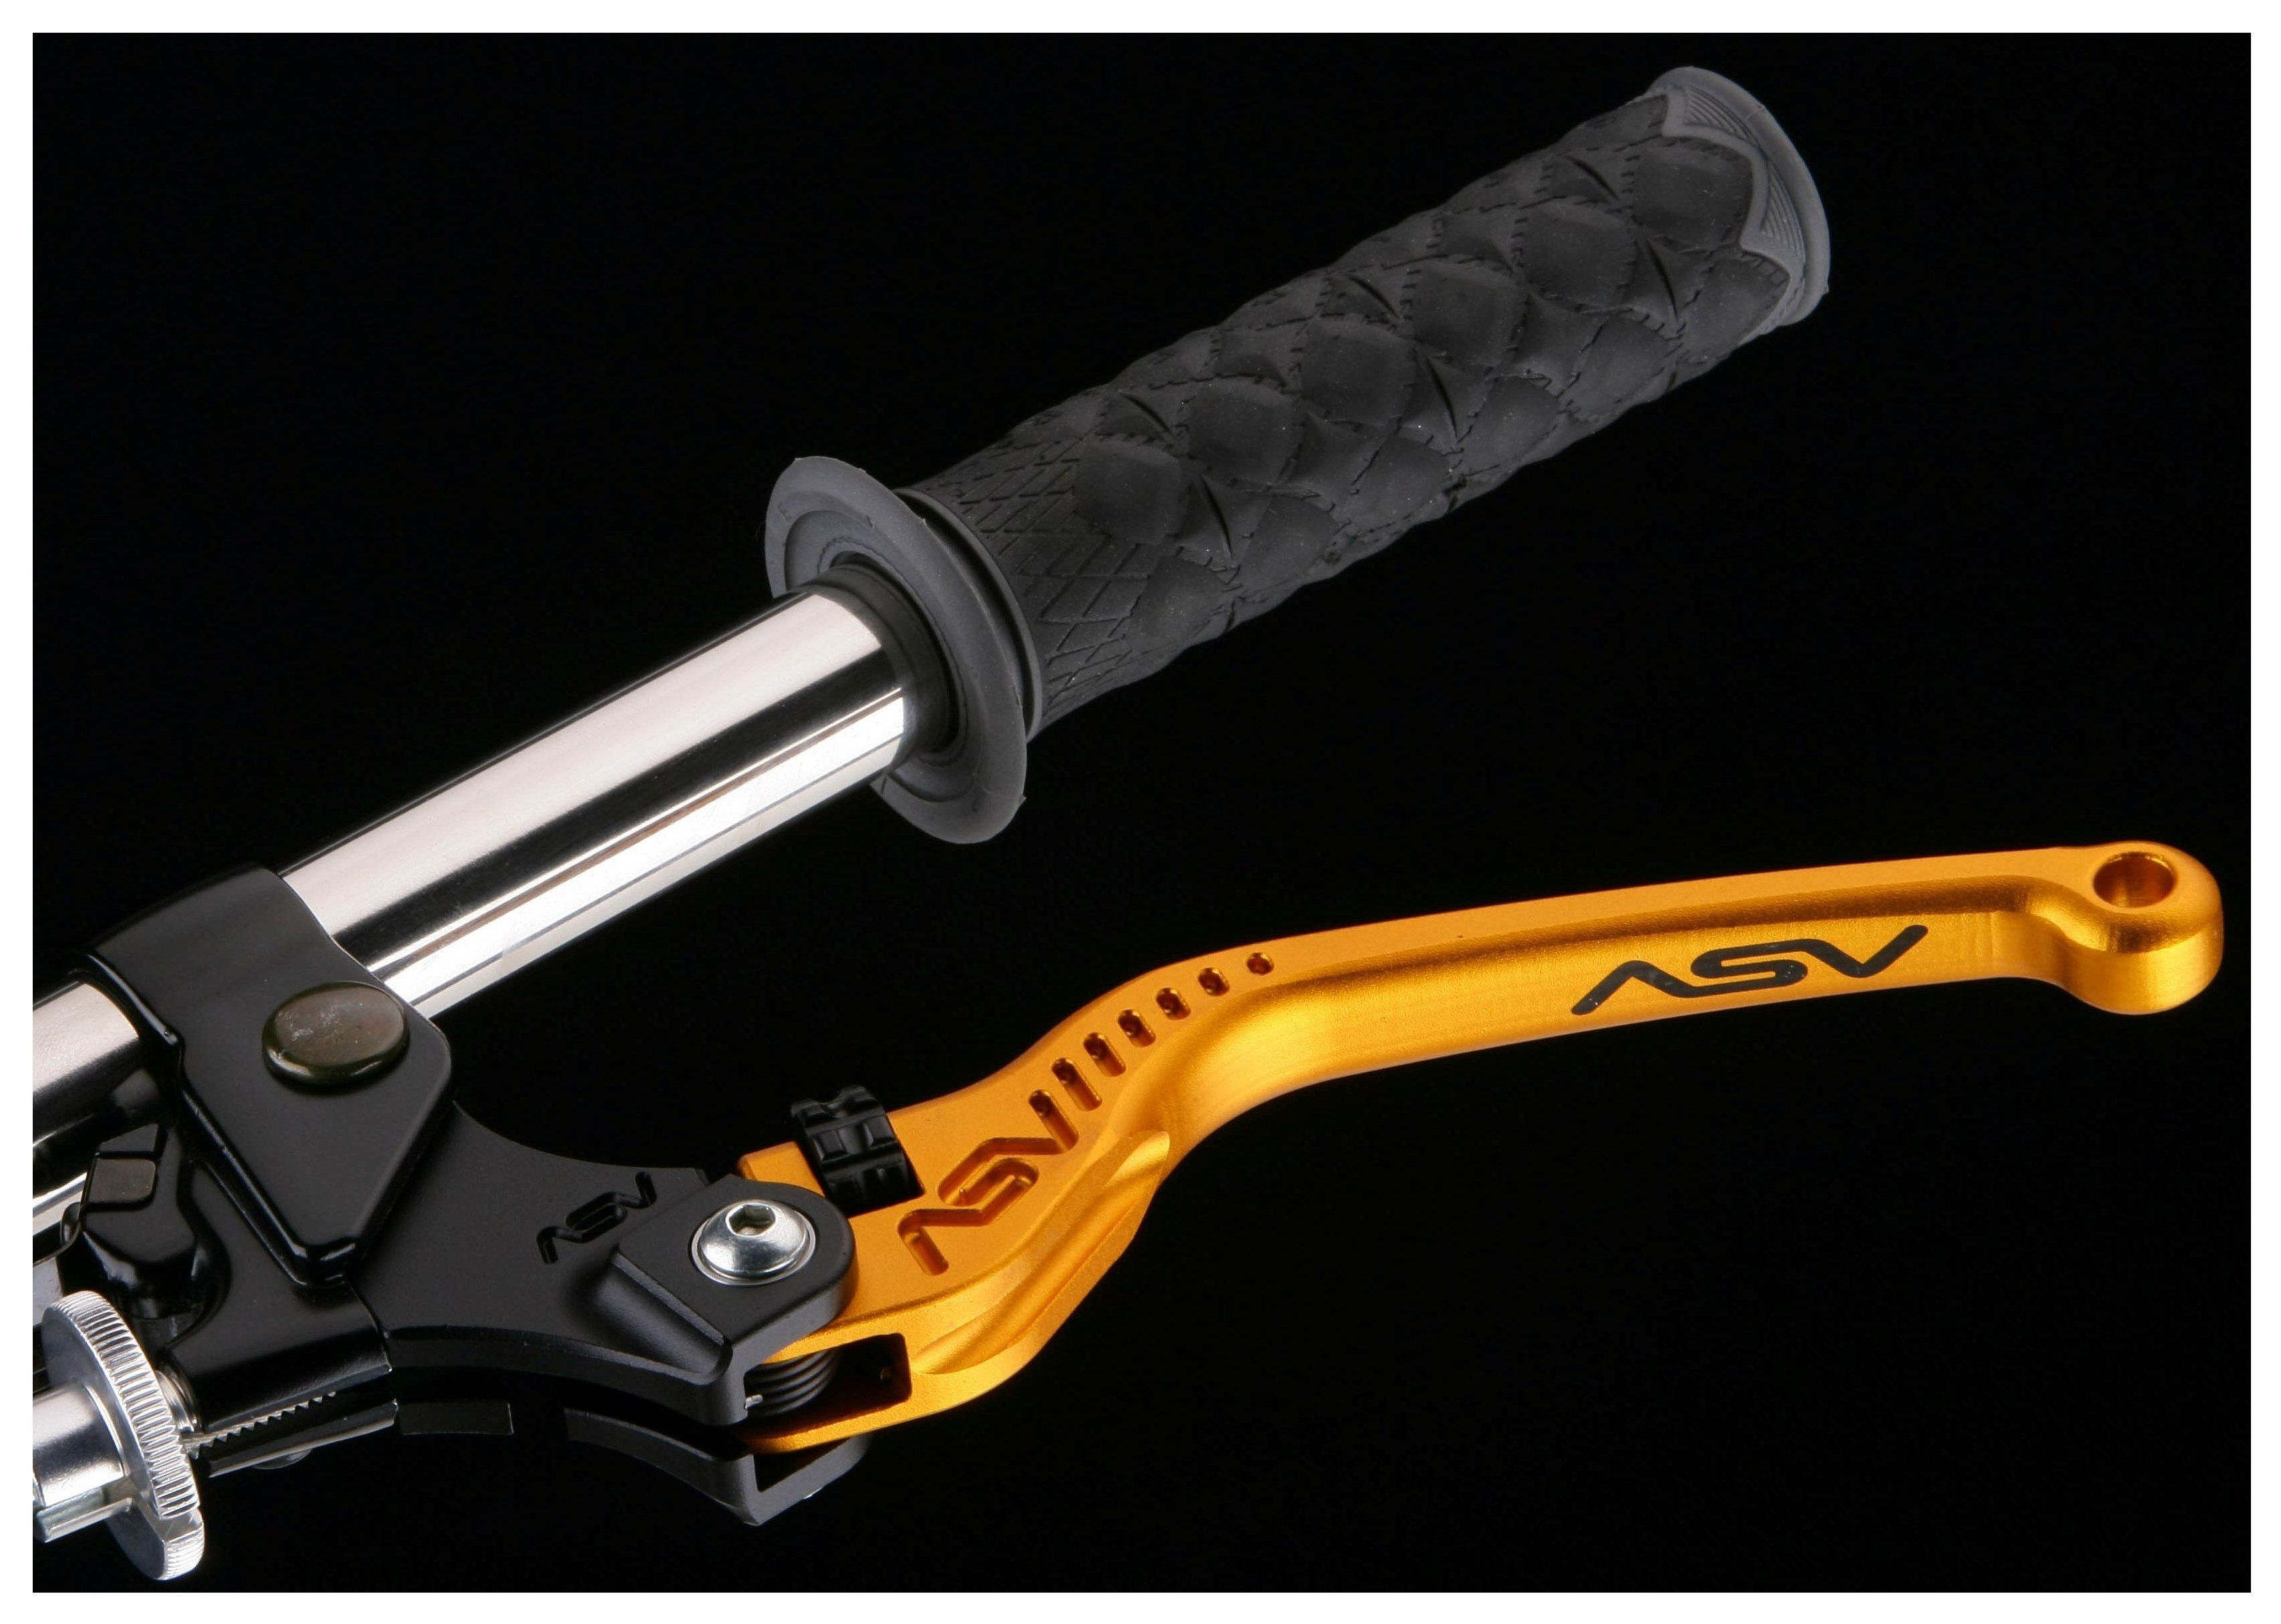 Buell CNC Billet Click Adjust Race Blade Brake Lever Gold Aluminum